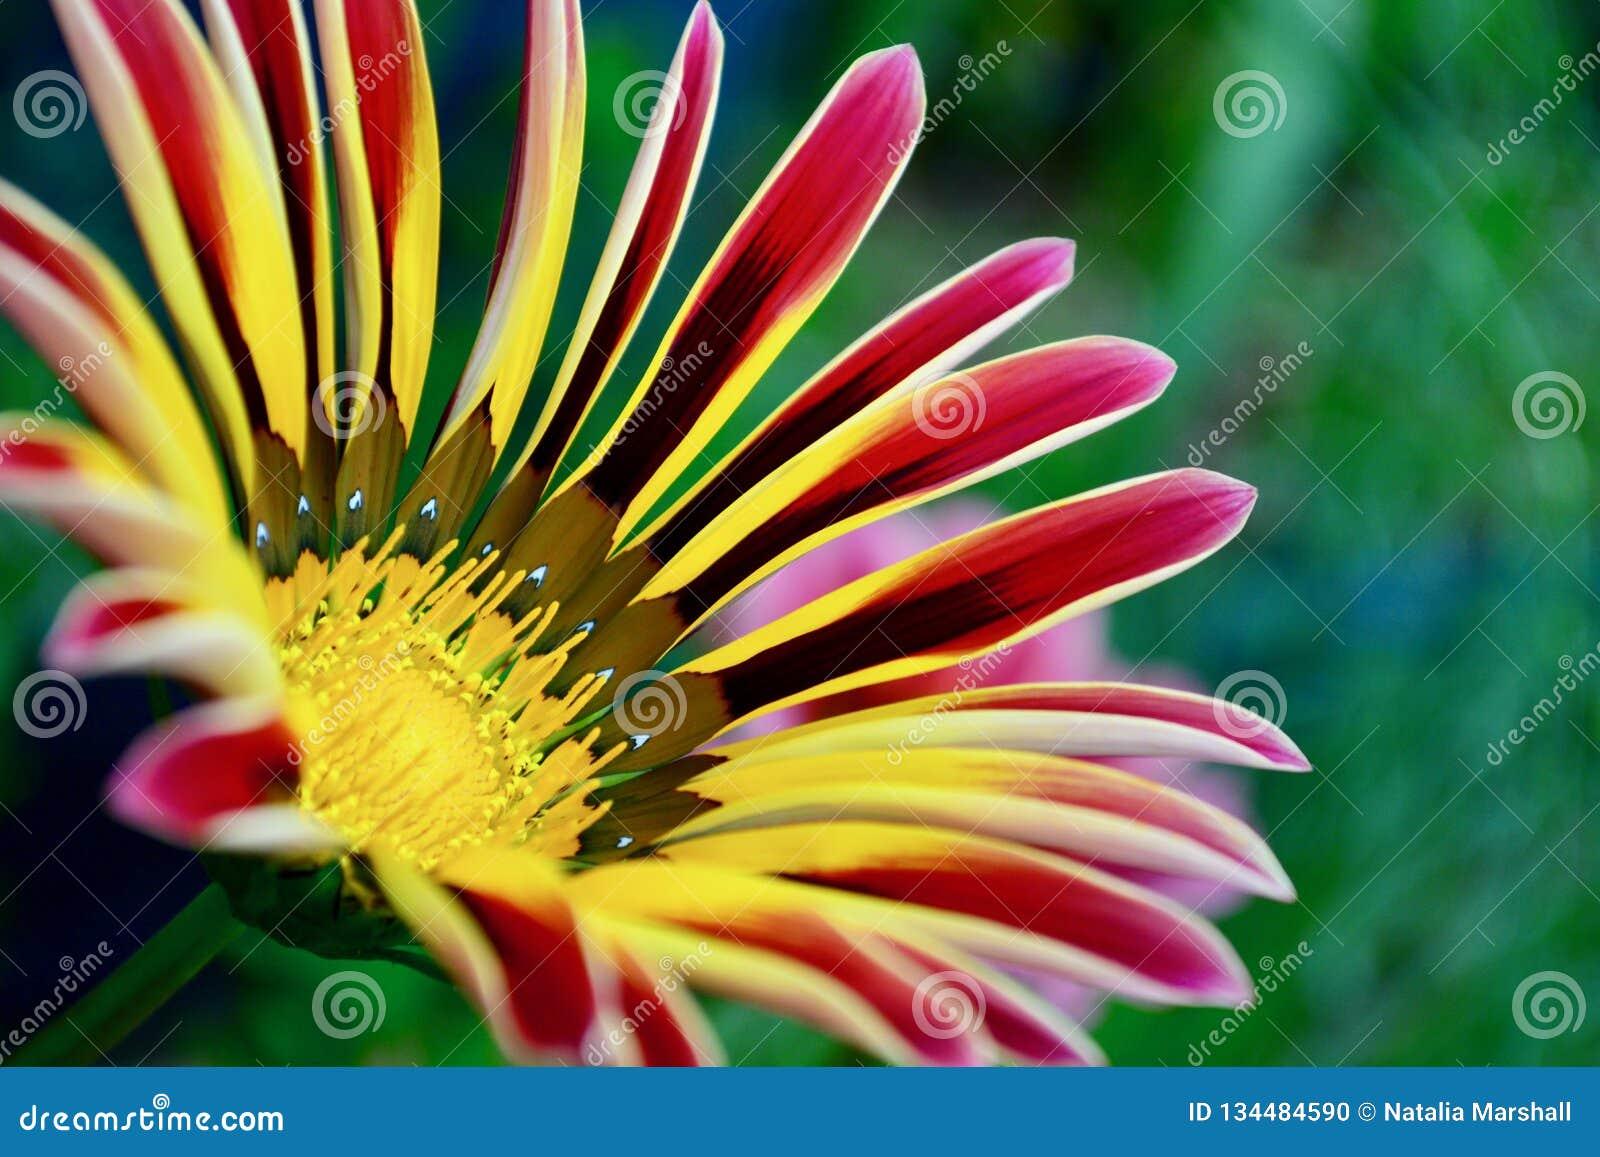 A close-up photo of a beautiful garden gazania flower.